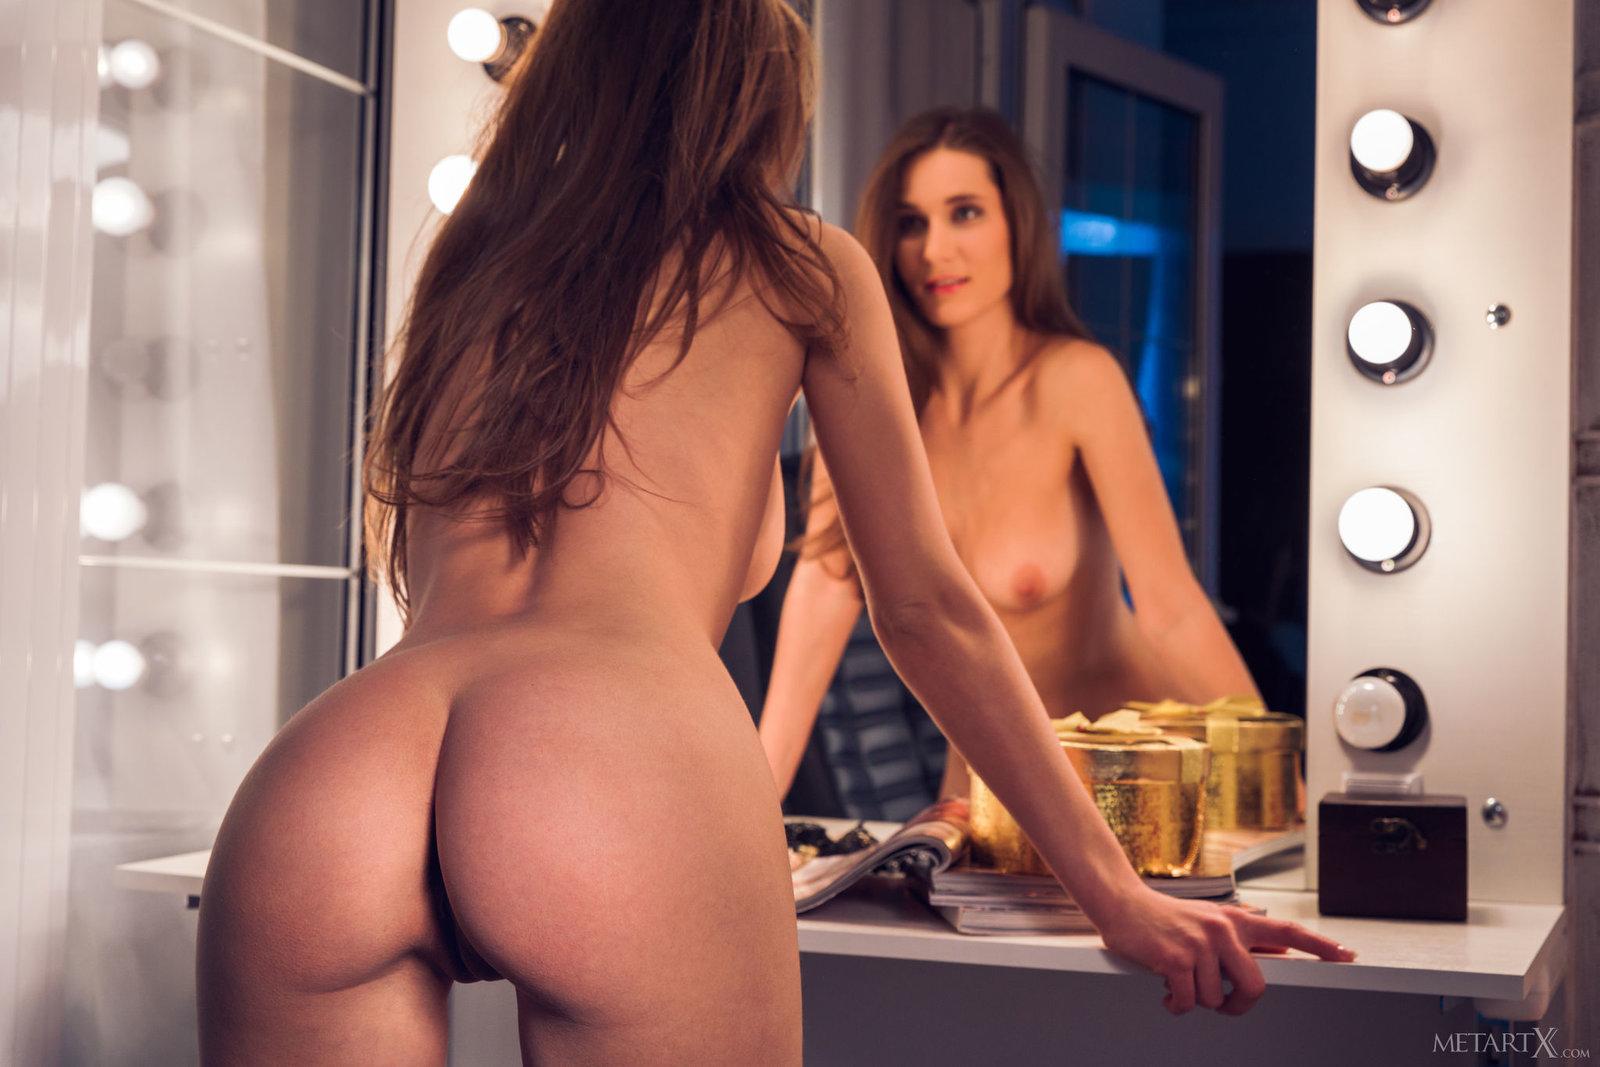 Mirror pussy pics